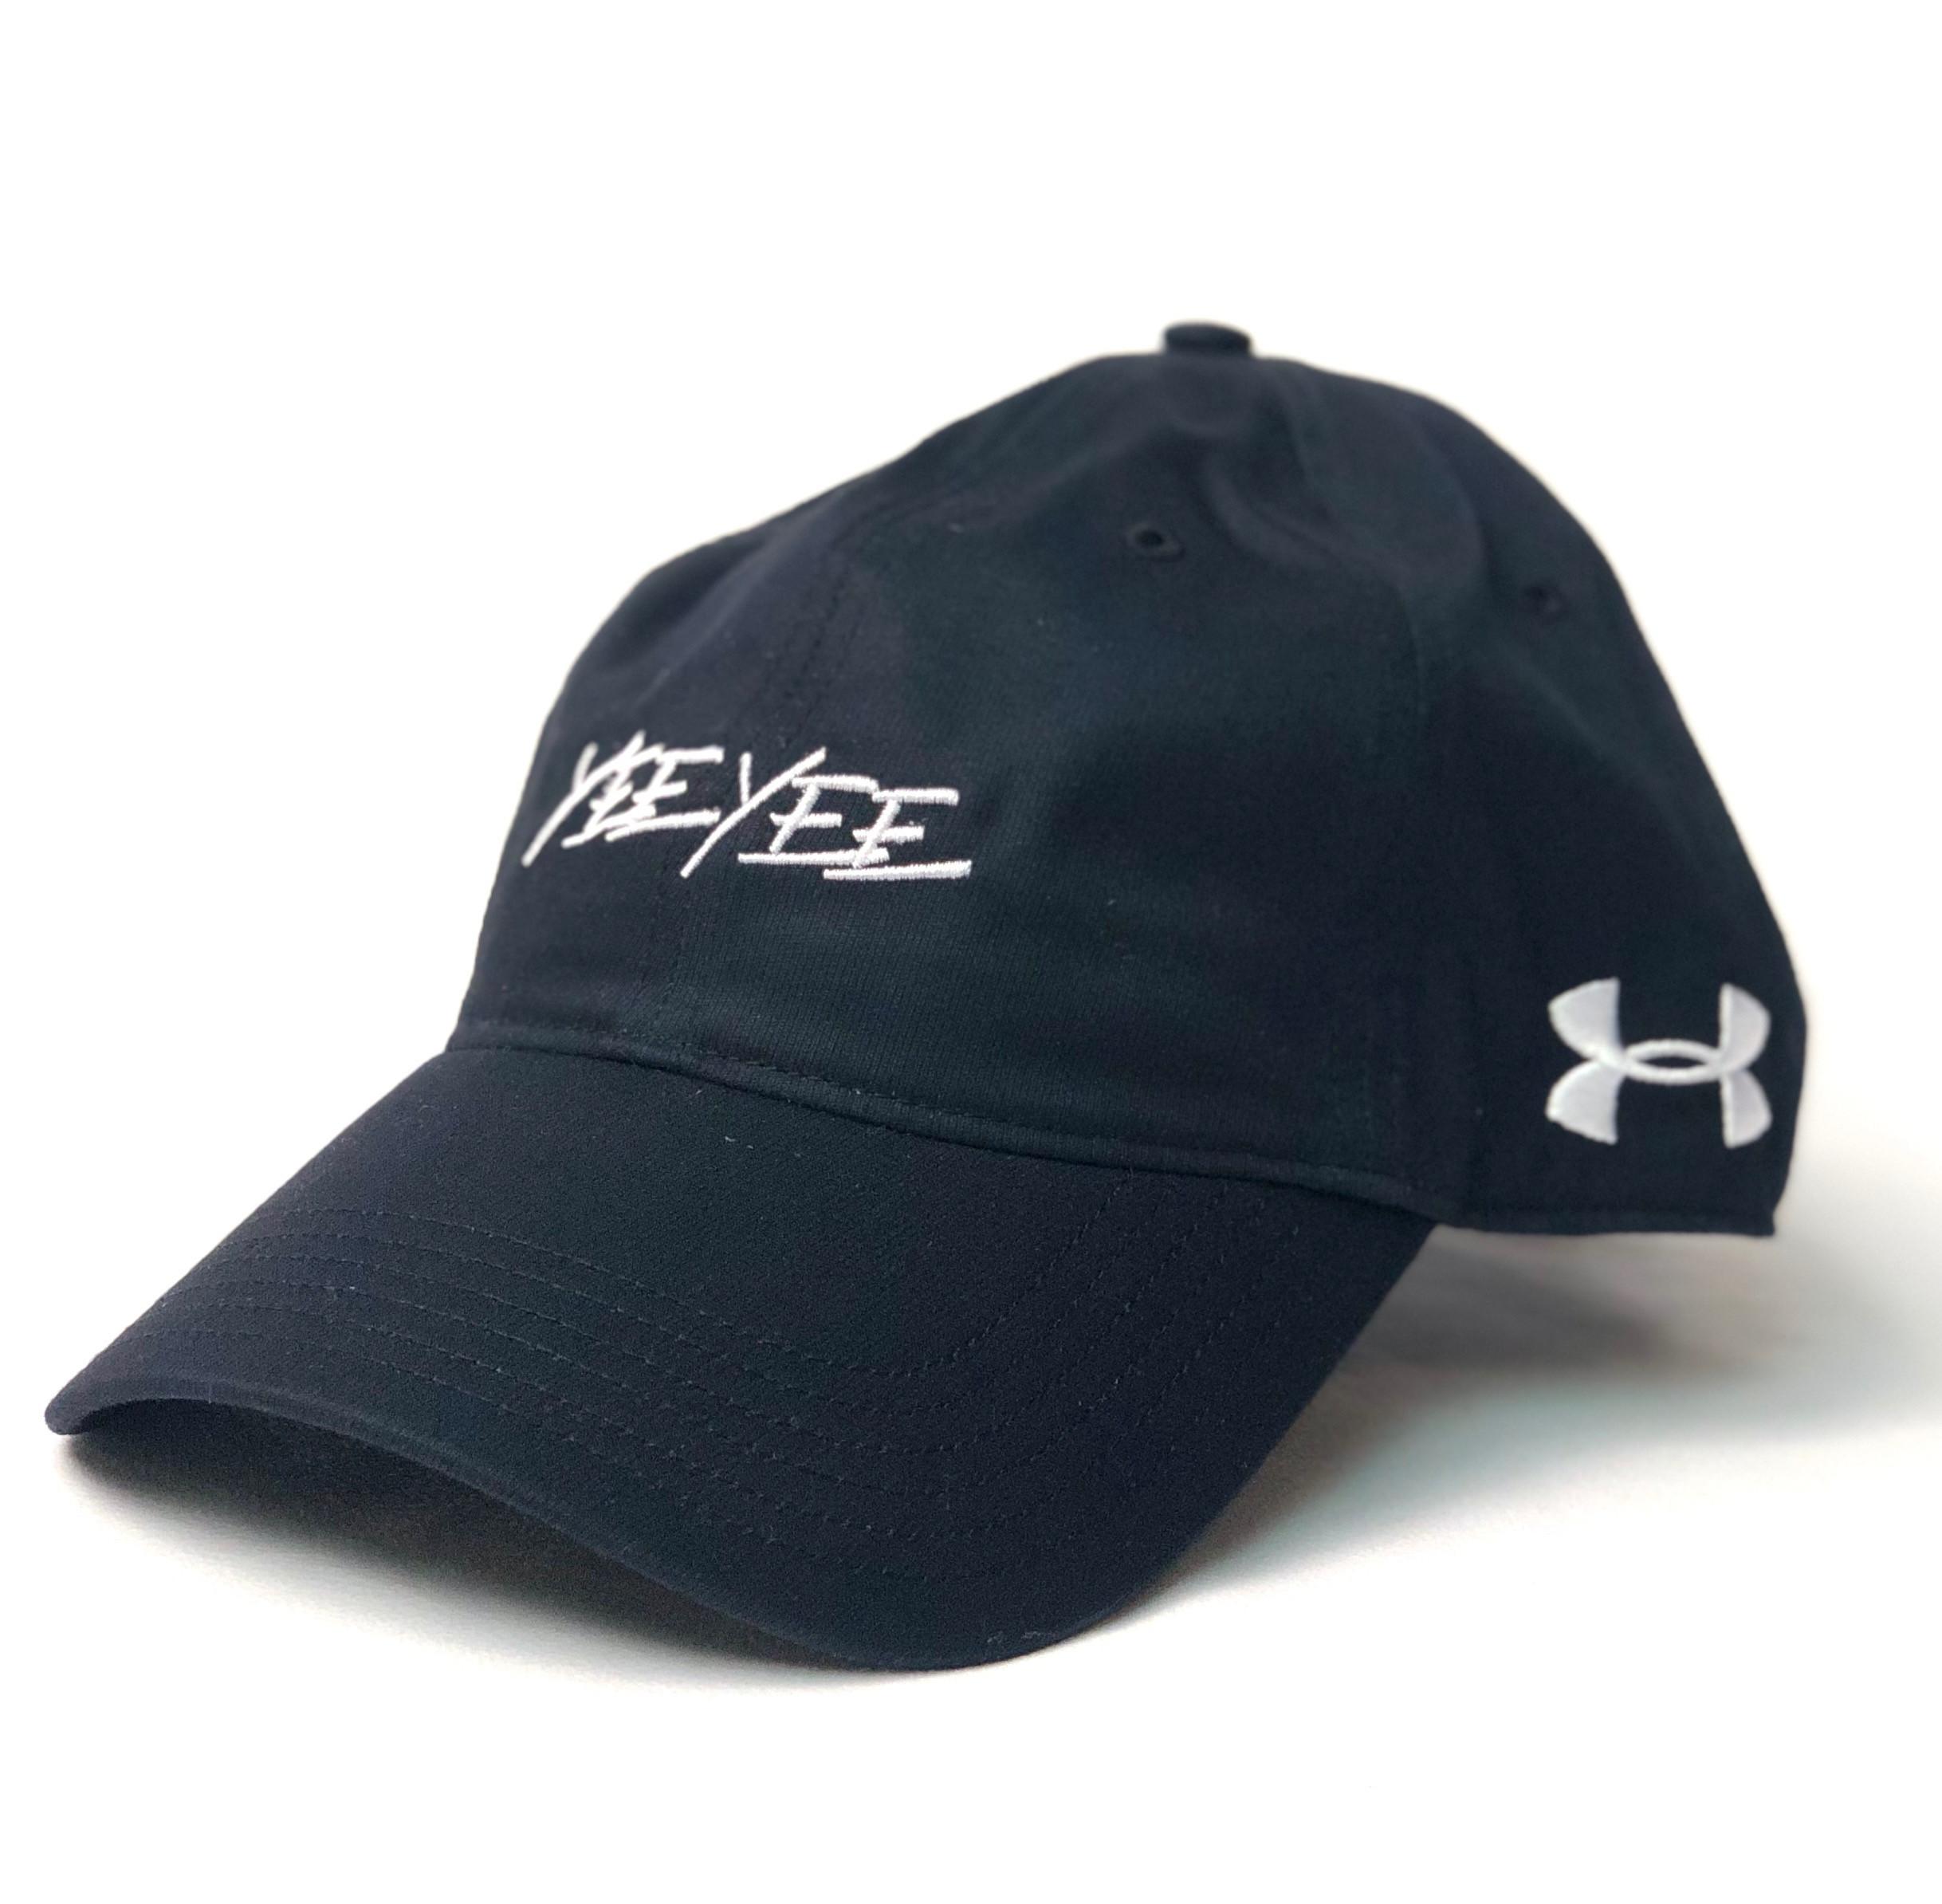 Yee Yee Under Armour Hat